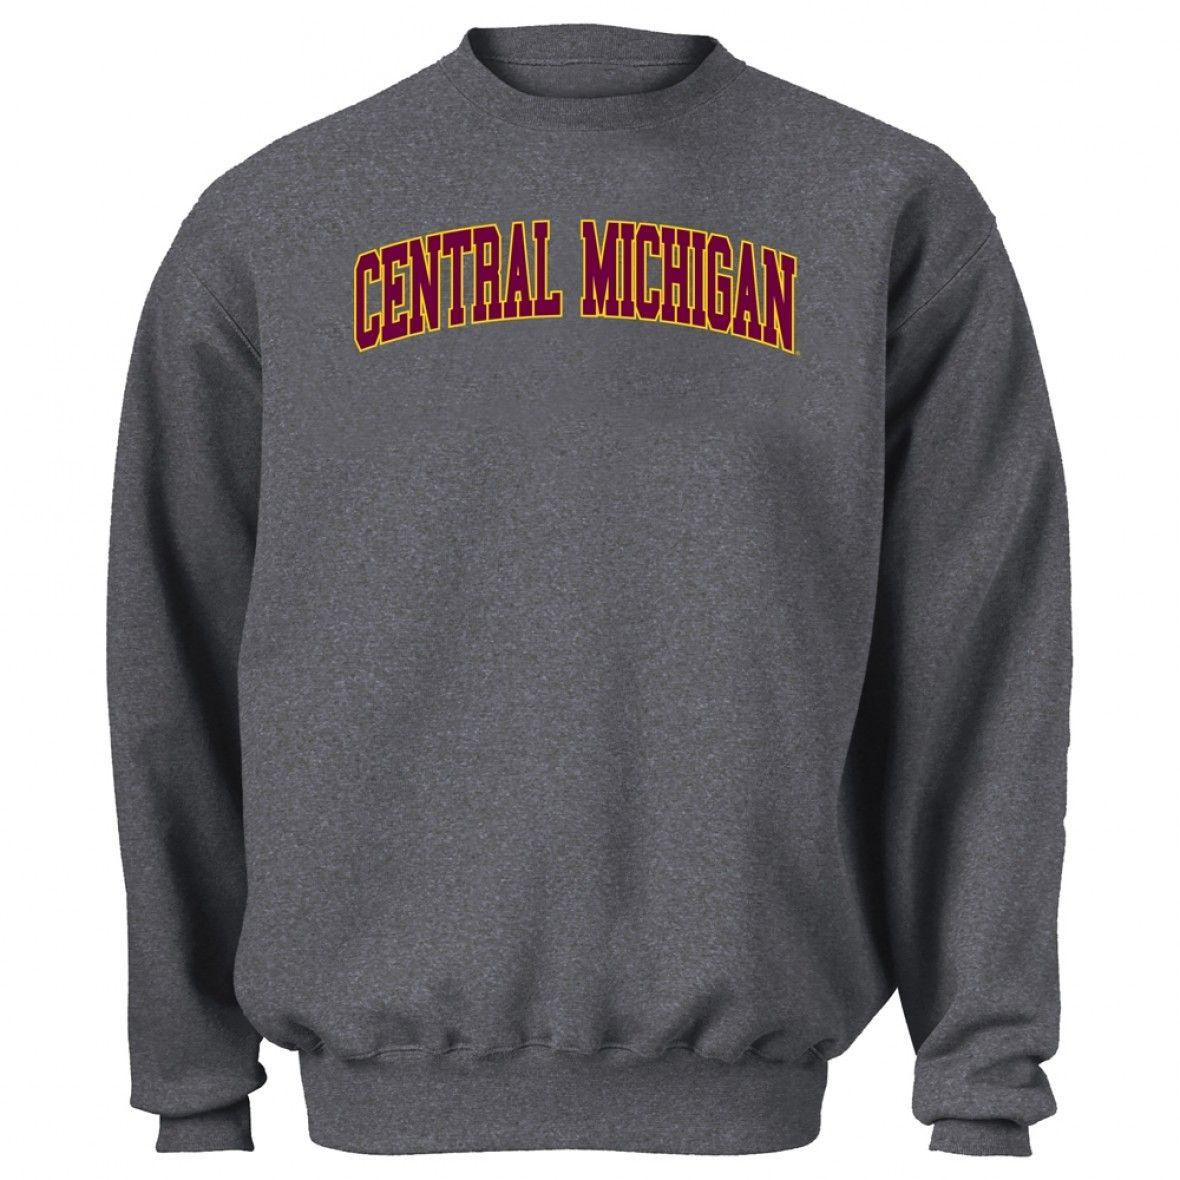 Cmu Arched 2 Color Sweatshirt A2t Sweatshirts College T Shirts College Hoodies [ 1180 x 1180 Pixel ]